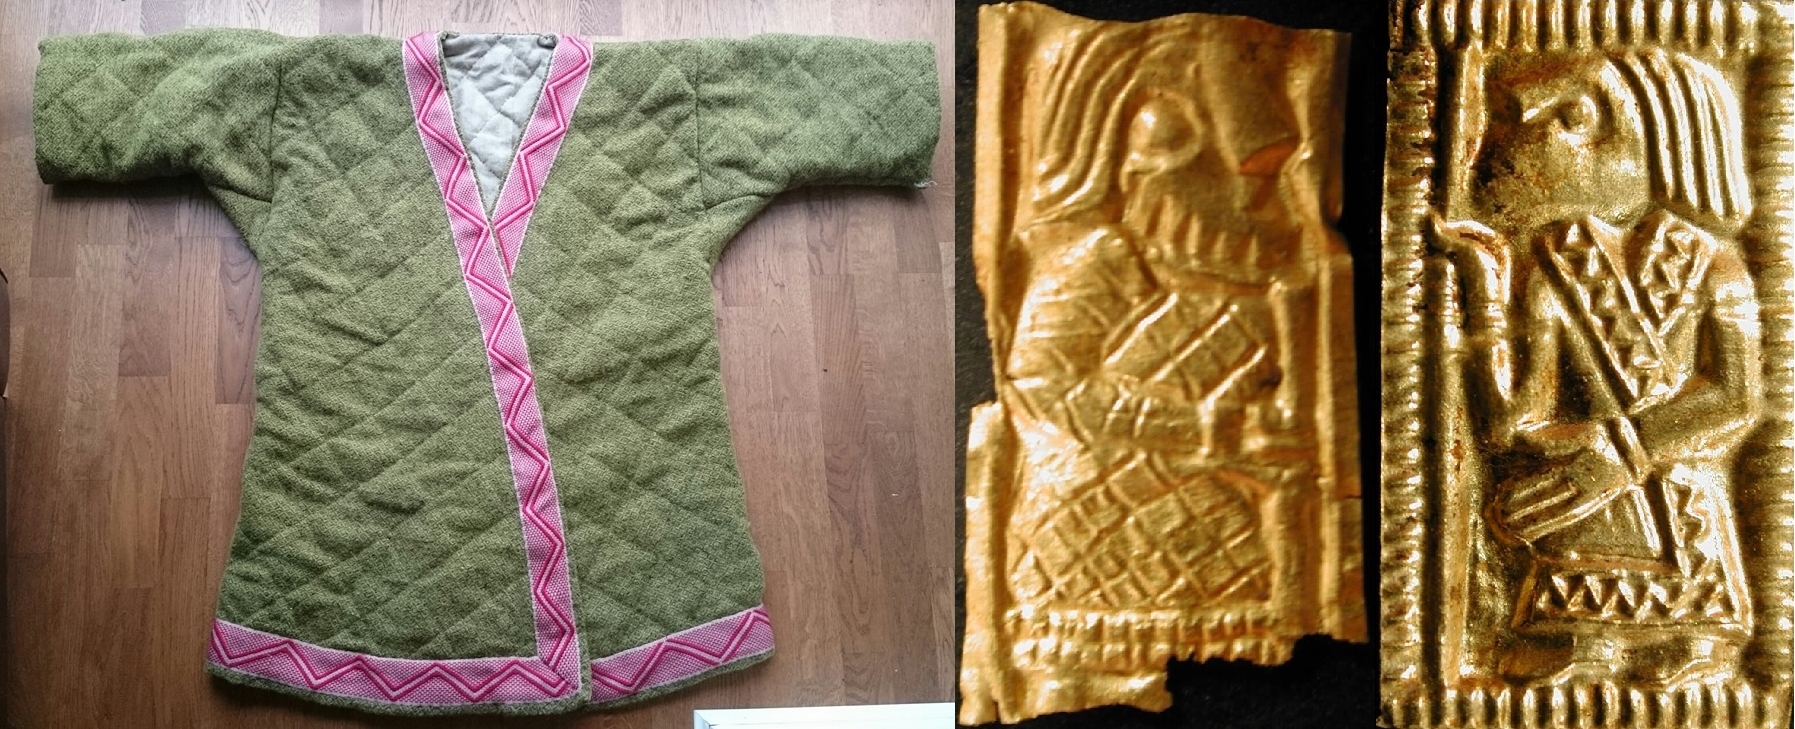 An interpretation of Vendel Age coat of Matt Bunker.